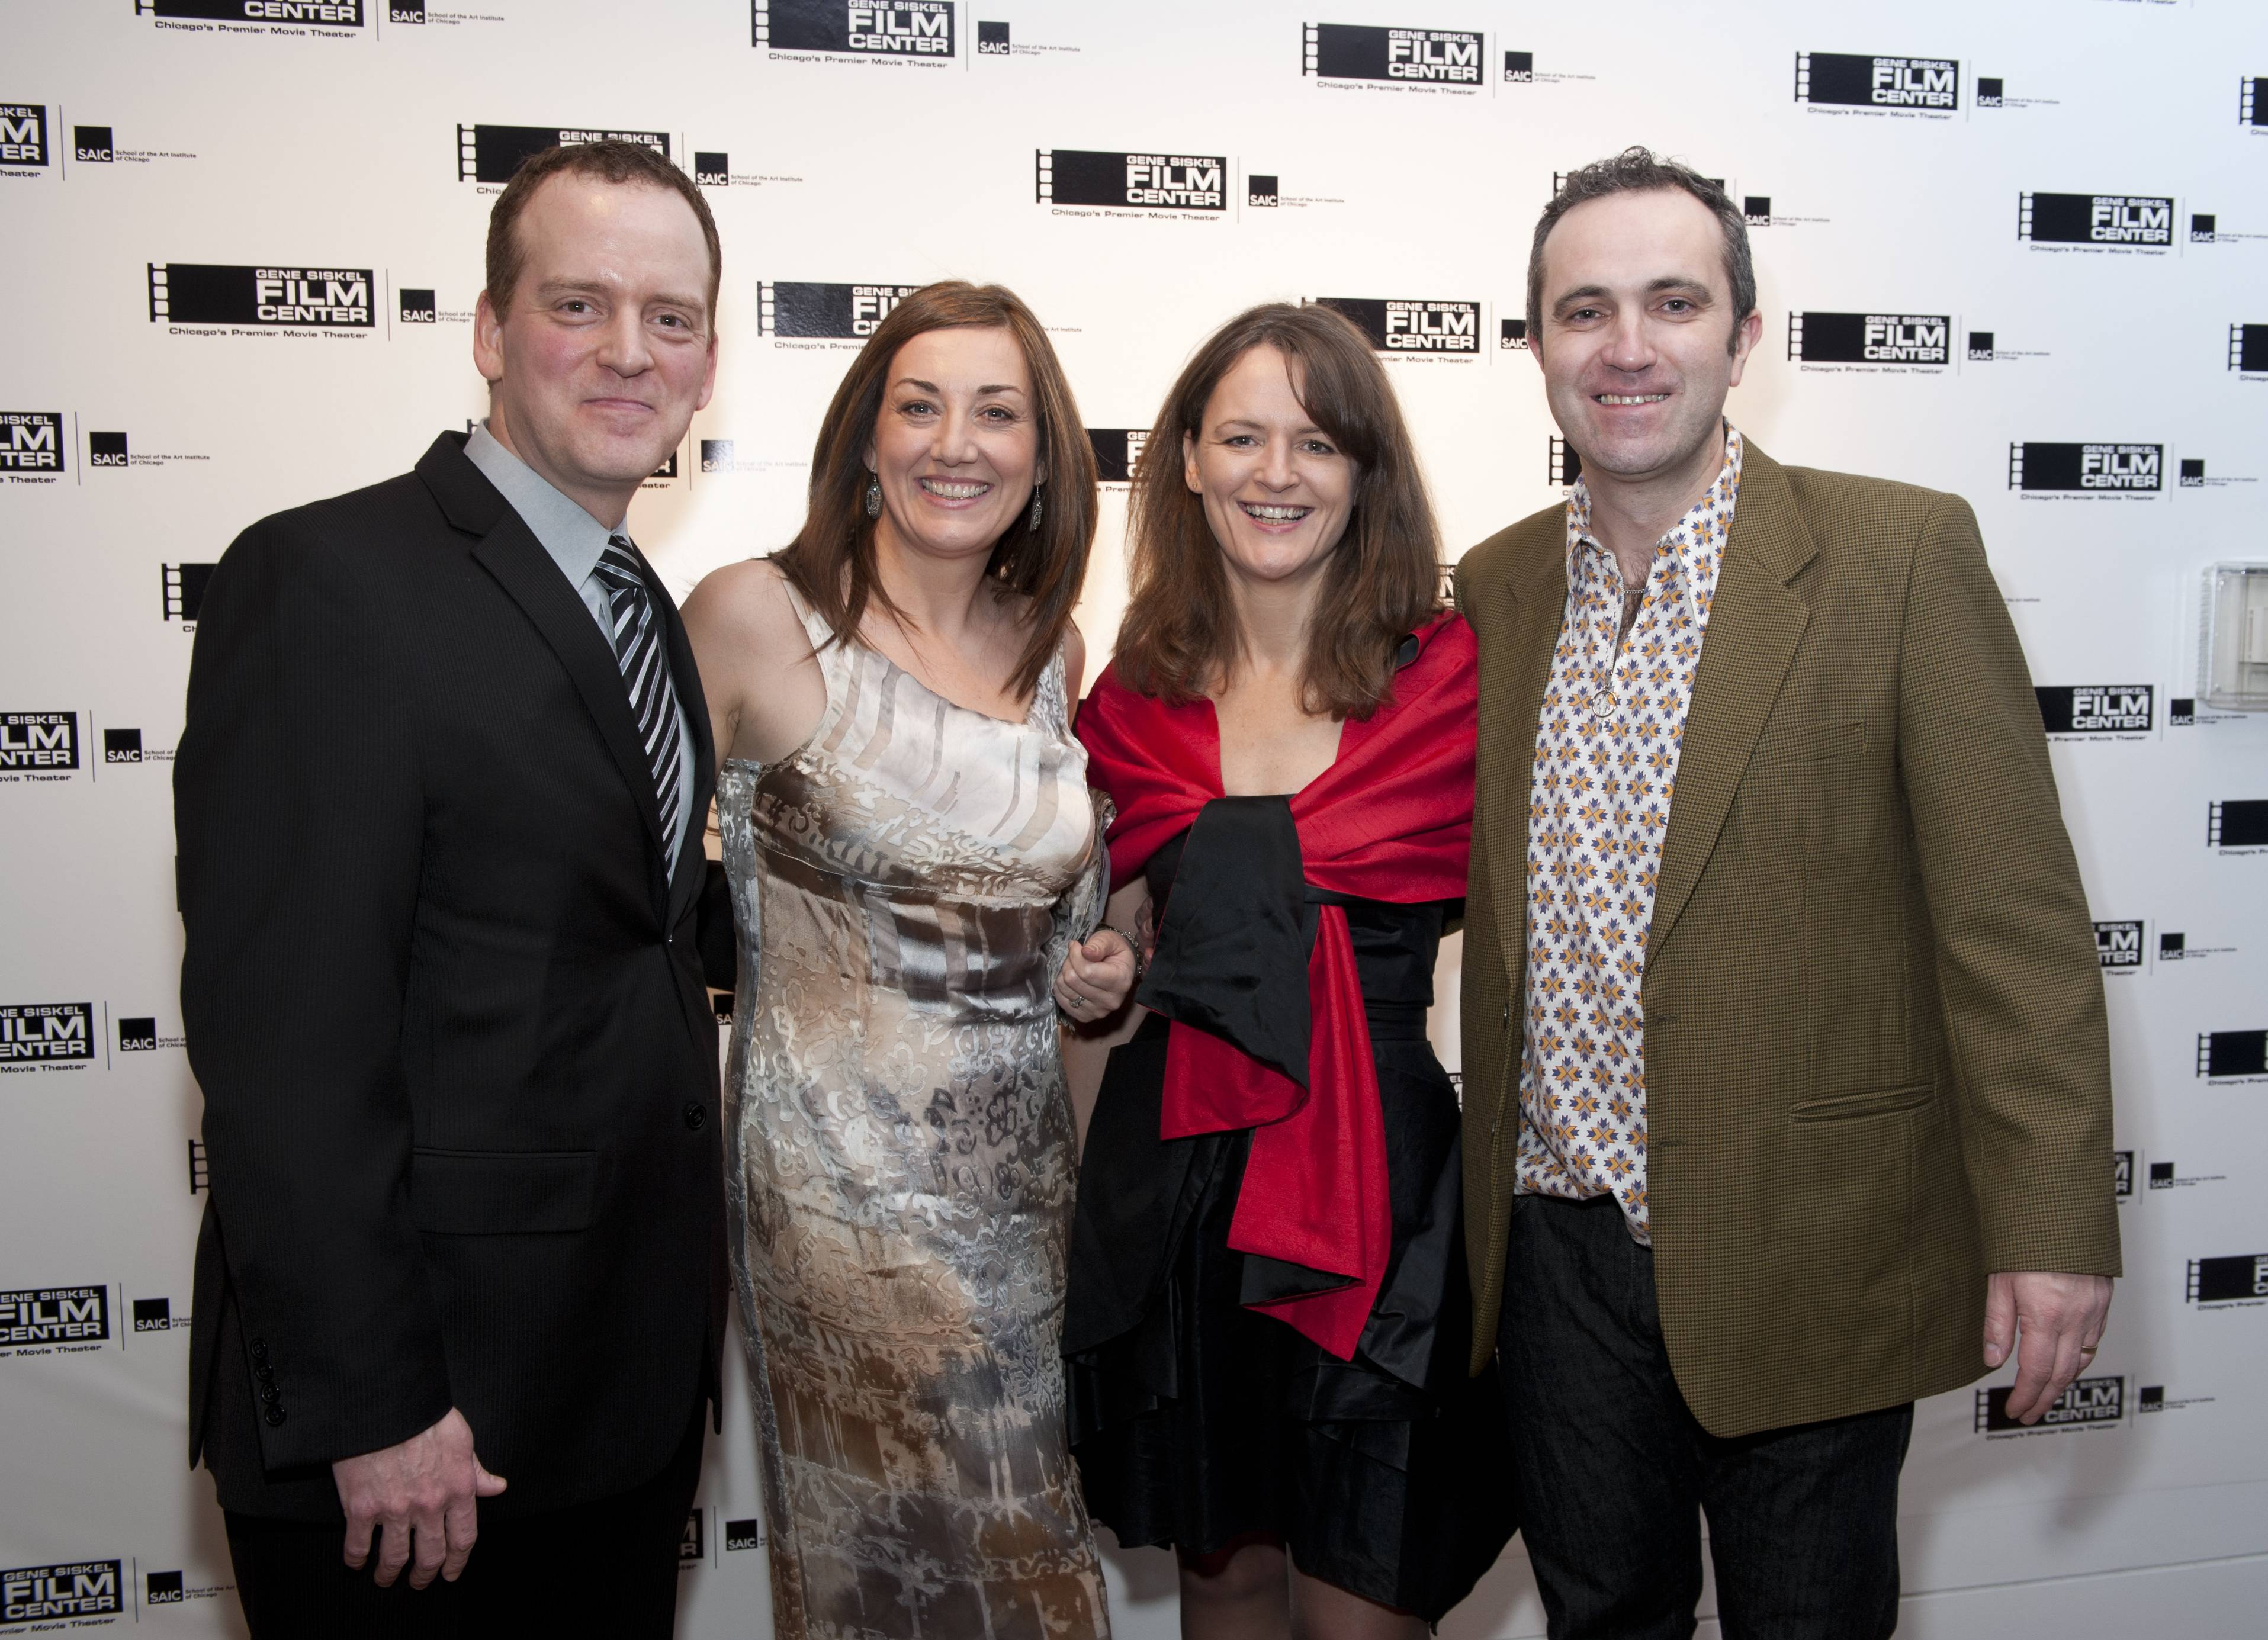 0164_David Hundley, Maggie Malone, Maedhbh and Aidan Cronin (Aidan – Irish Consul General)